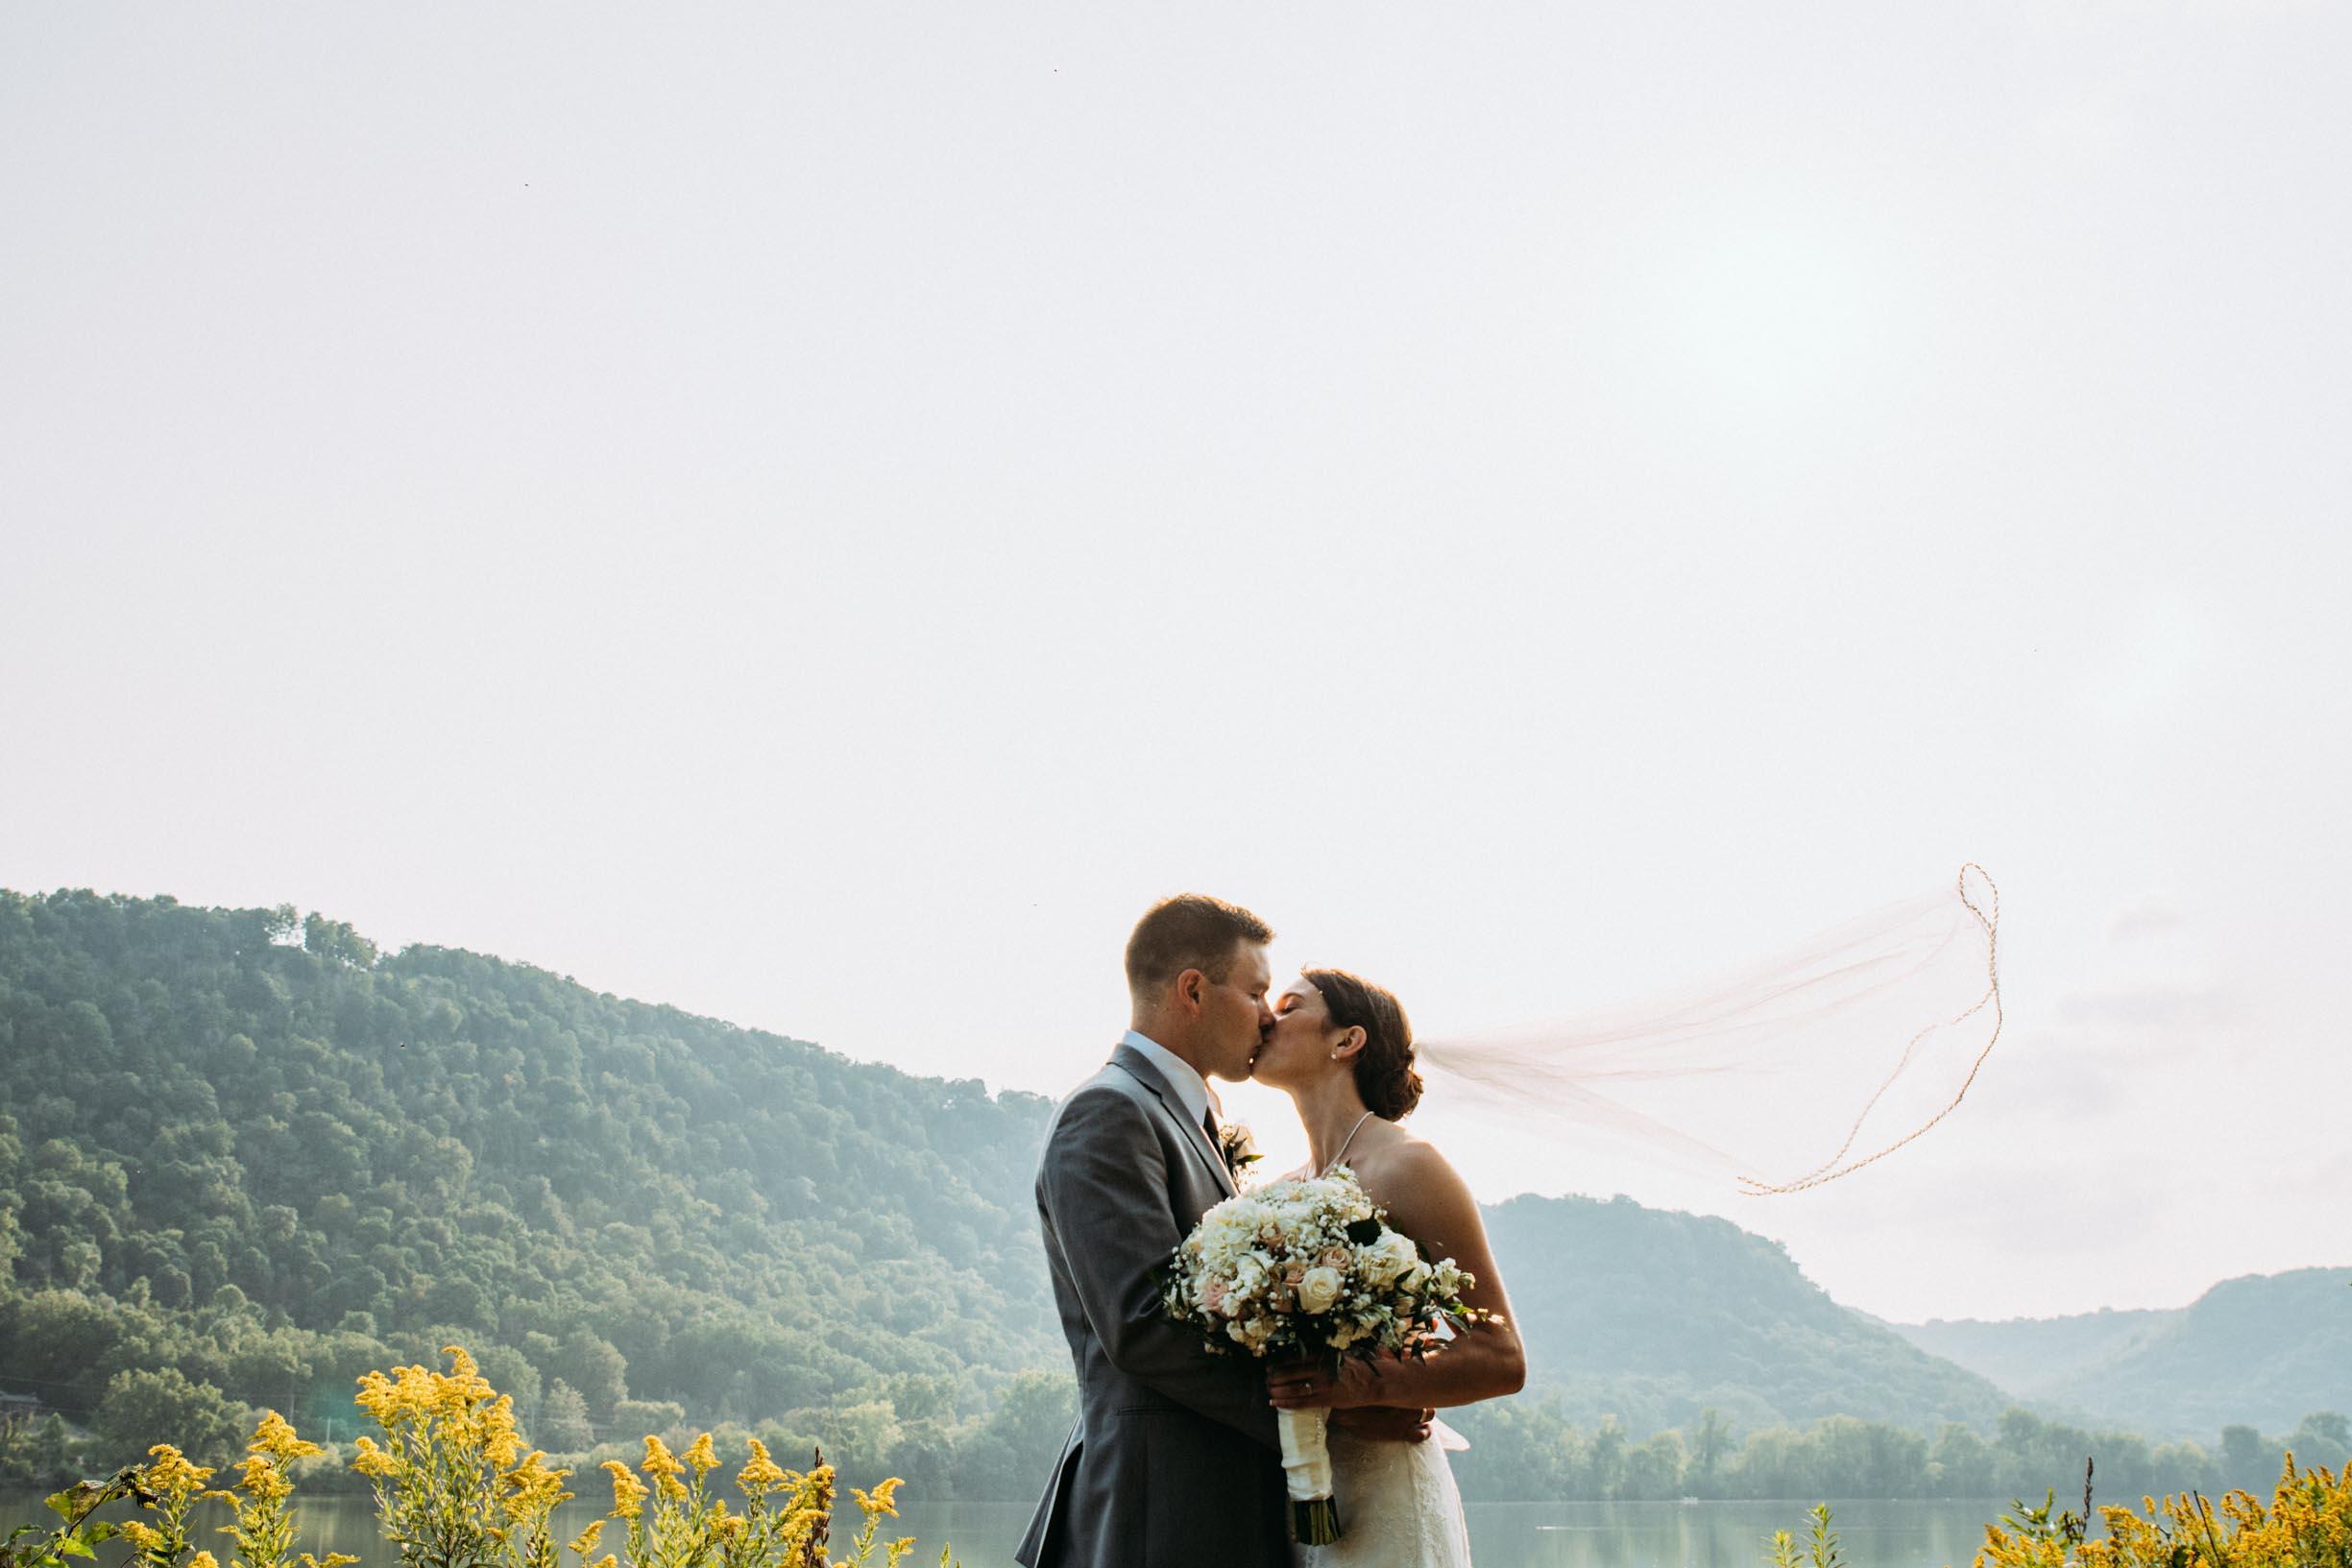 29-Lindsey Jake Wedding Portraits Winona Bride Groom.jpg